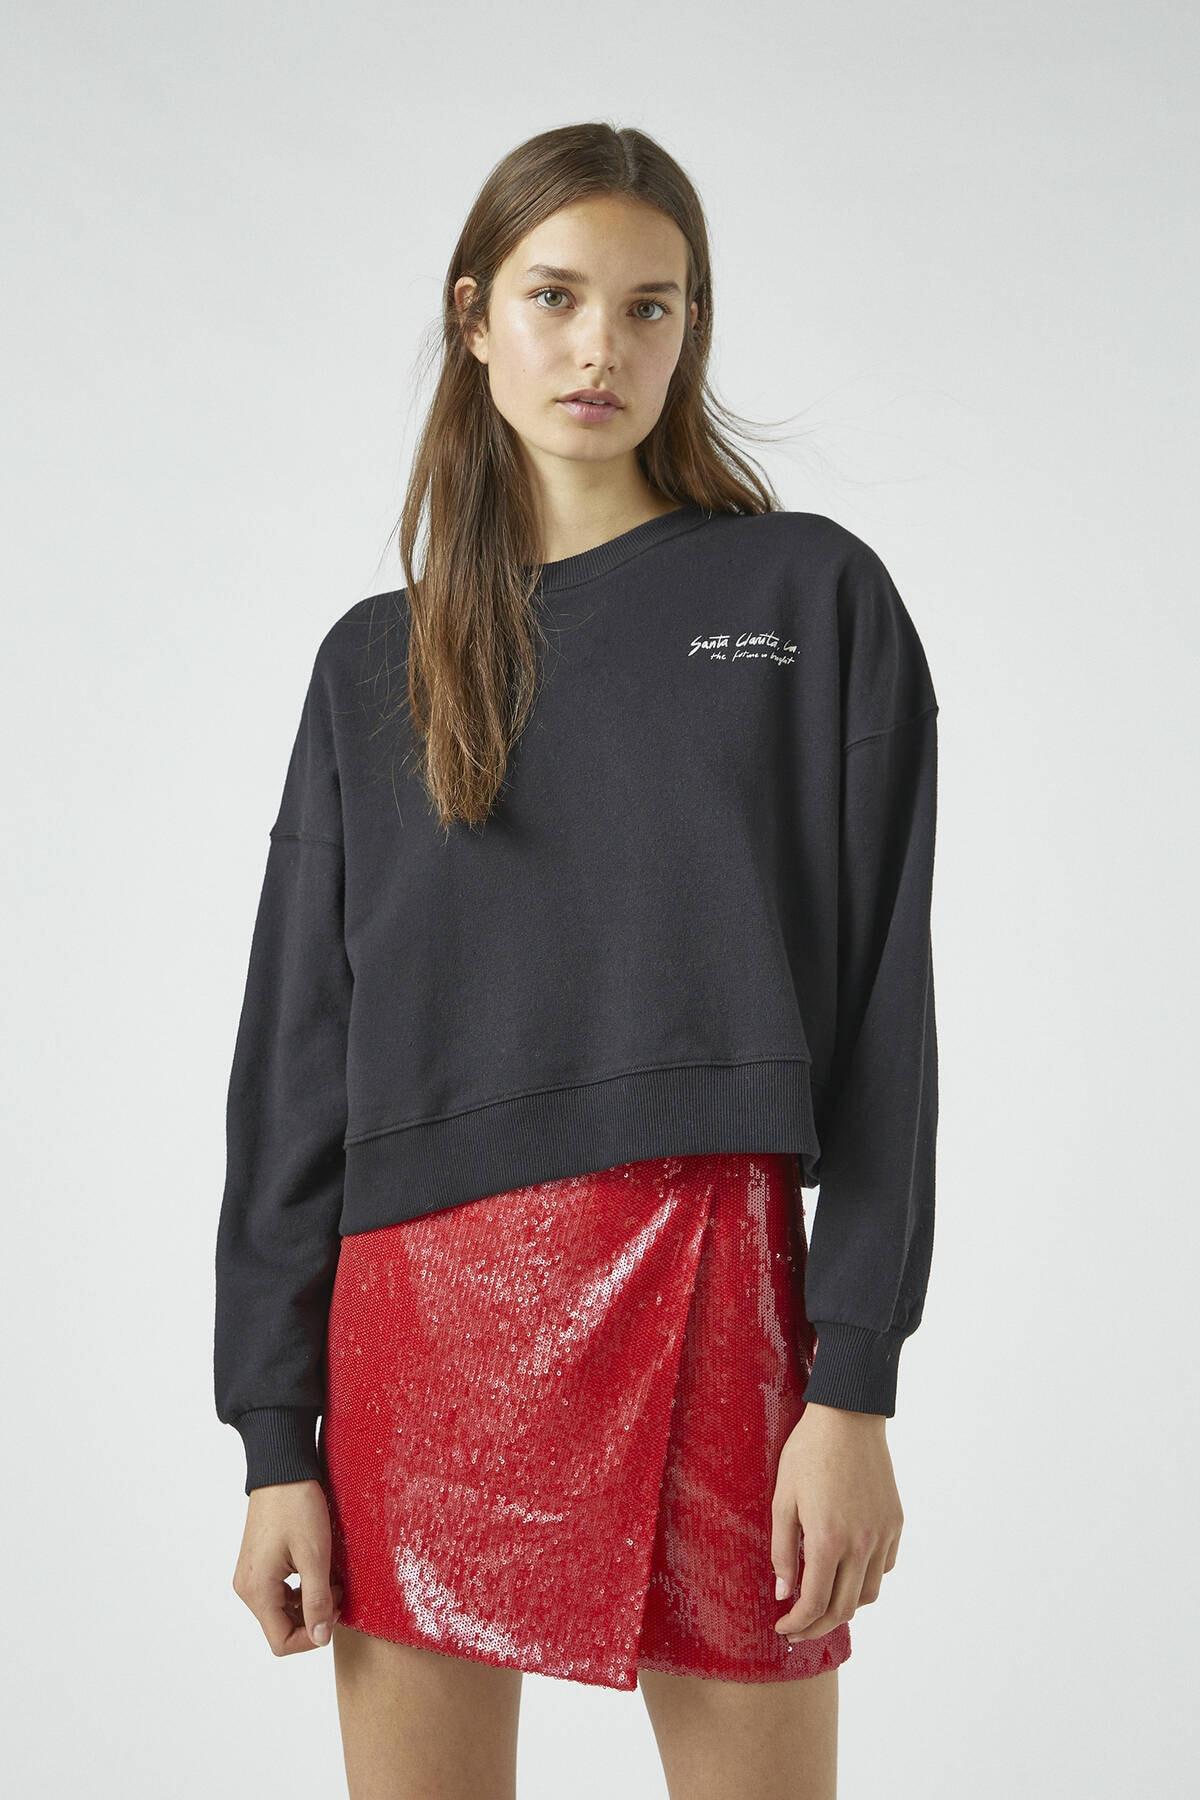 Pull & Bear Kadın Siyah Kontrast Sloganlı Uzun Kollu Sweatshirt 09594316